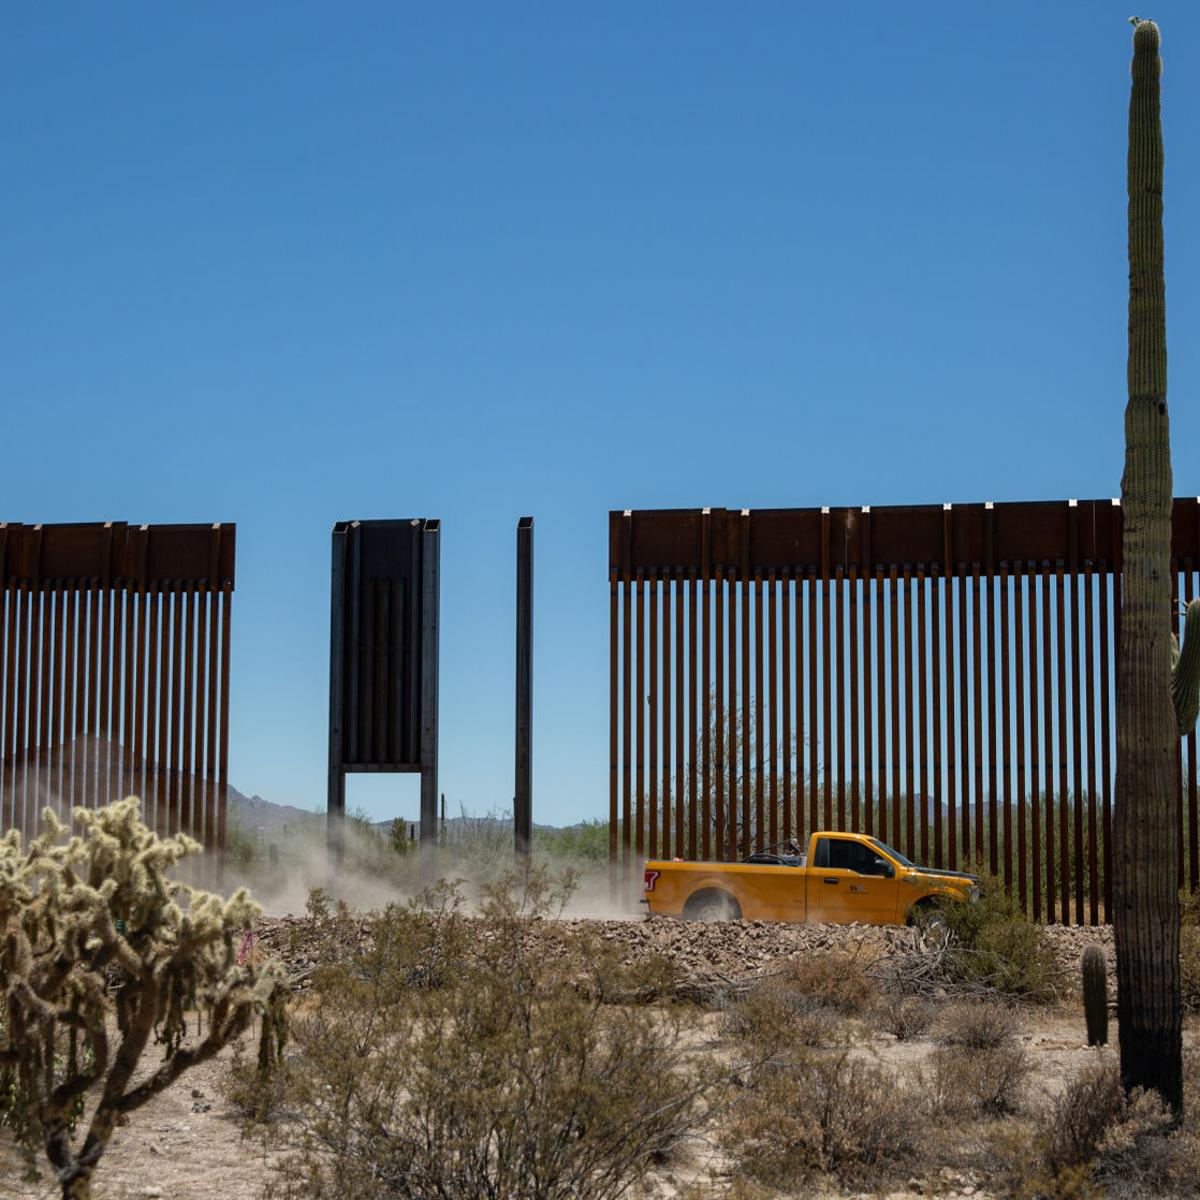 Activists Near Tucson Santa Fe Mark Indigenous Peoples Day Arizona And Regional News Tucson Com